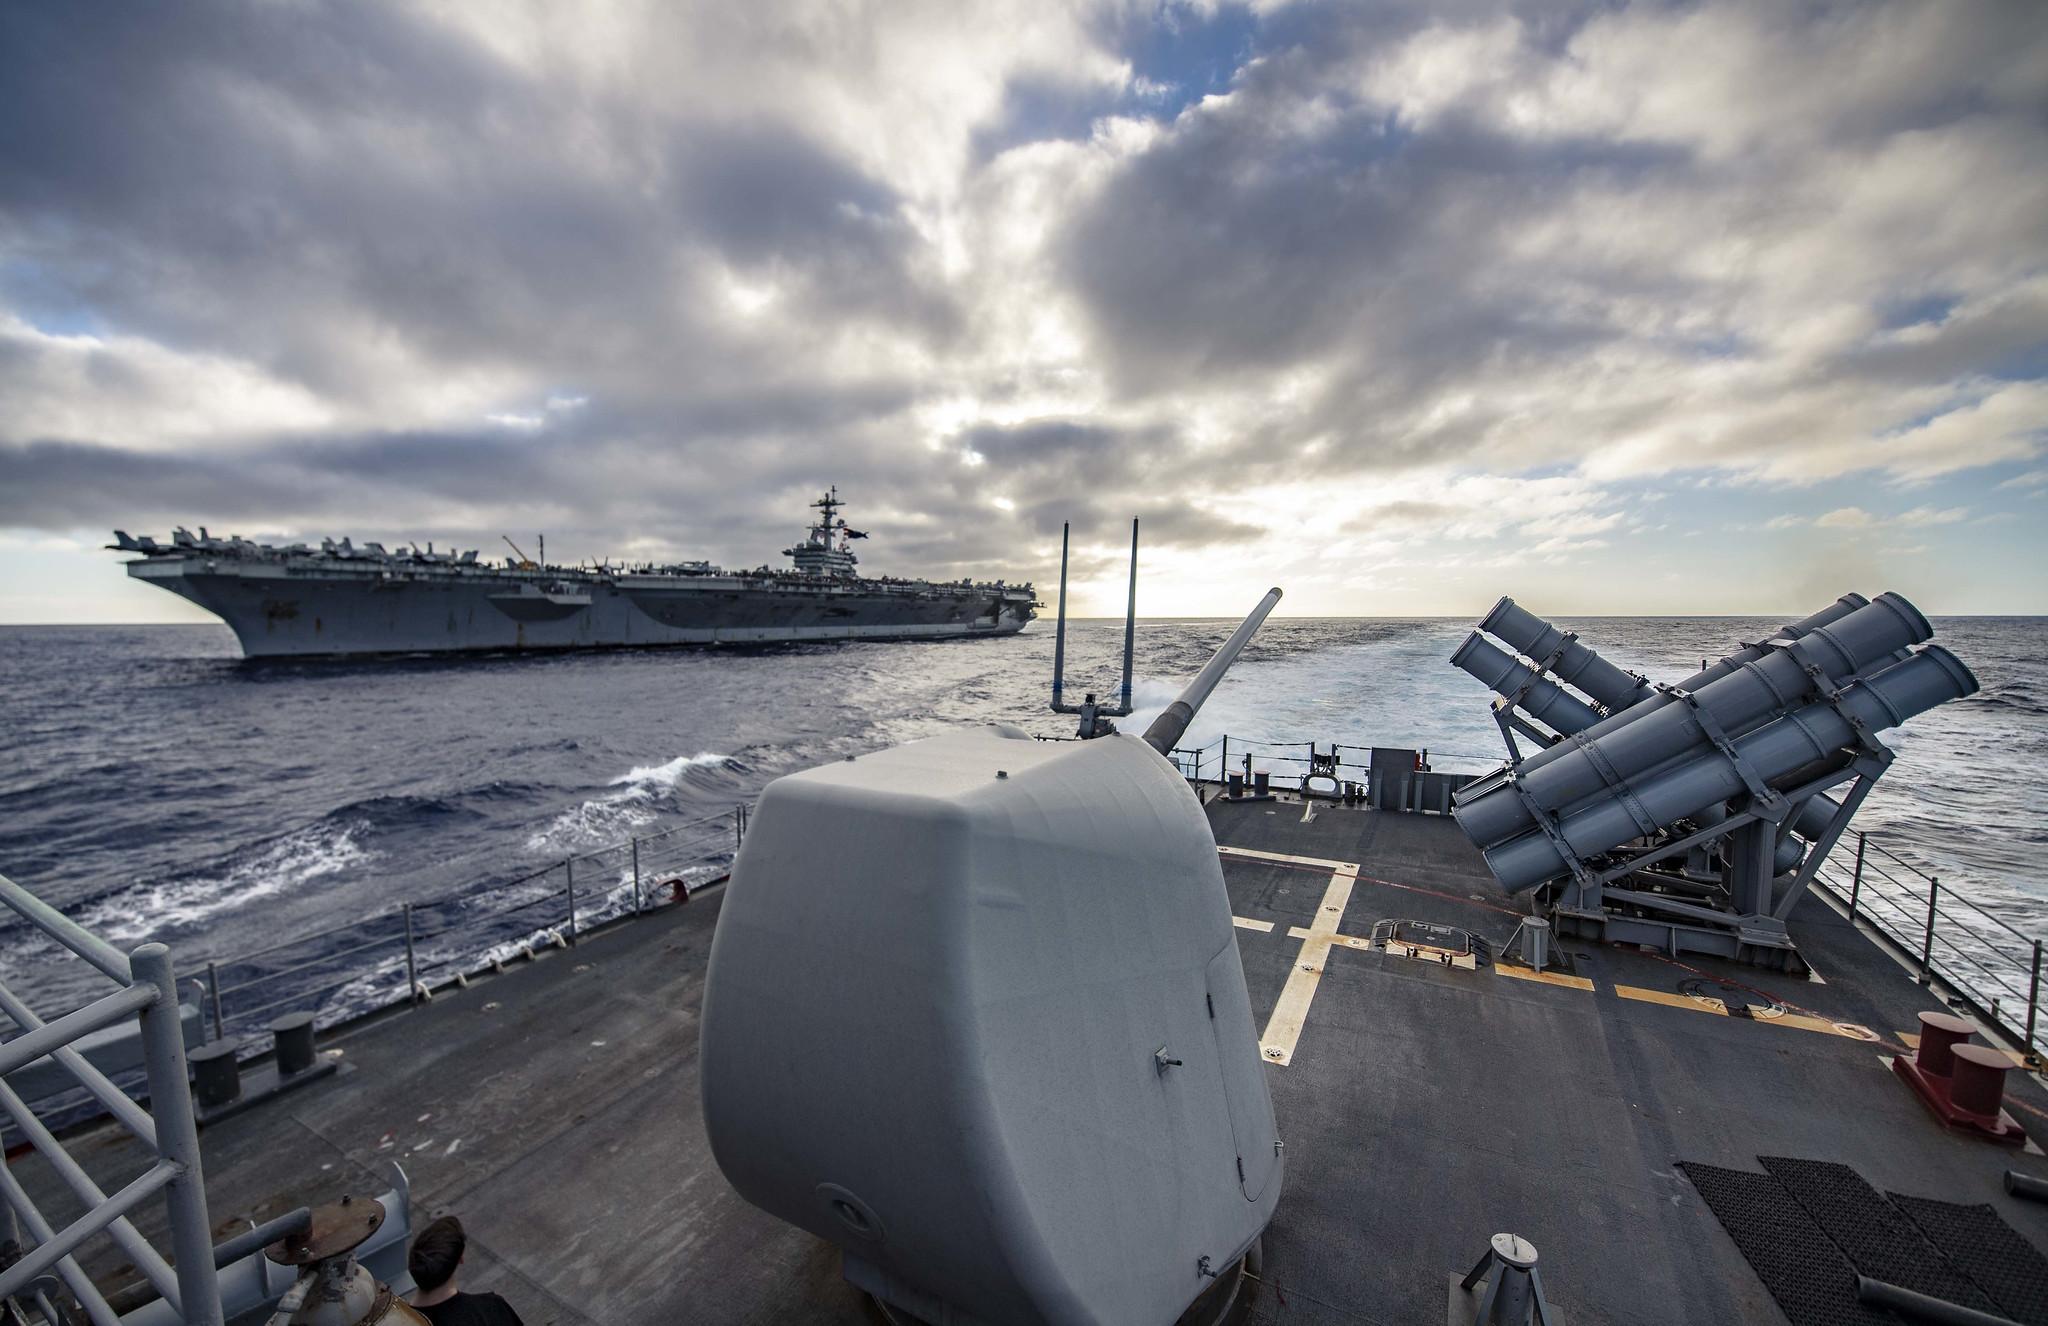 Uss Abraham Lincoln Arrives In Pearl Harbor For Port Visit